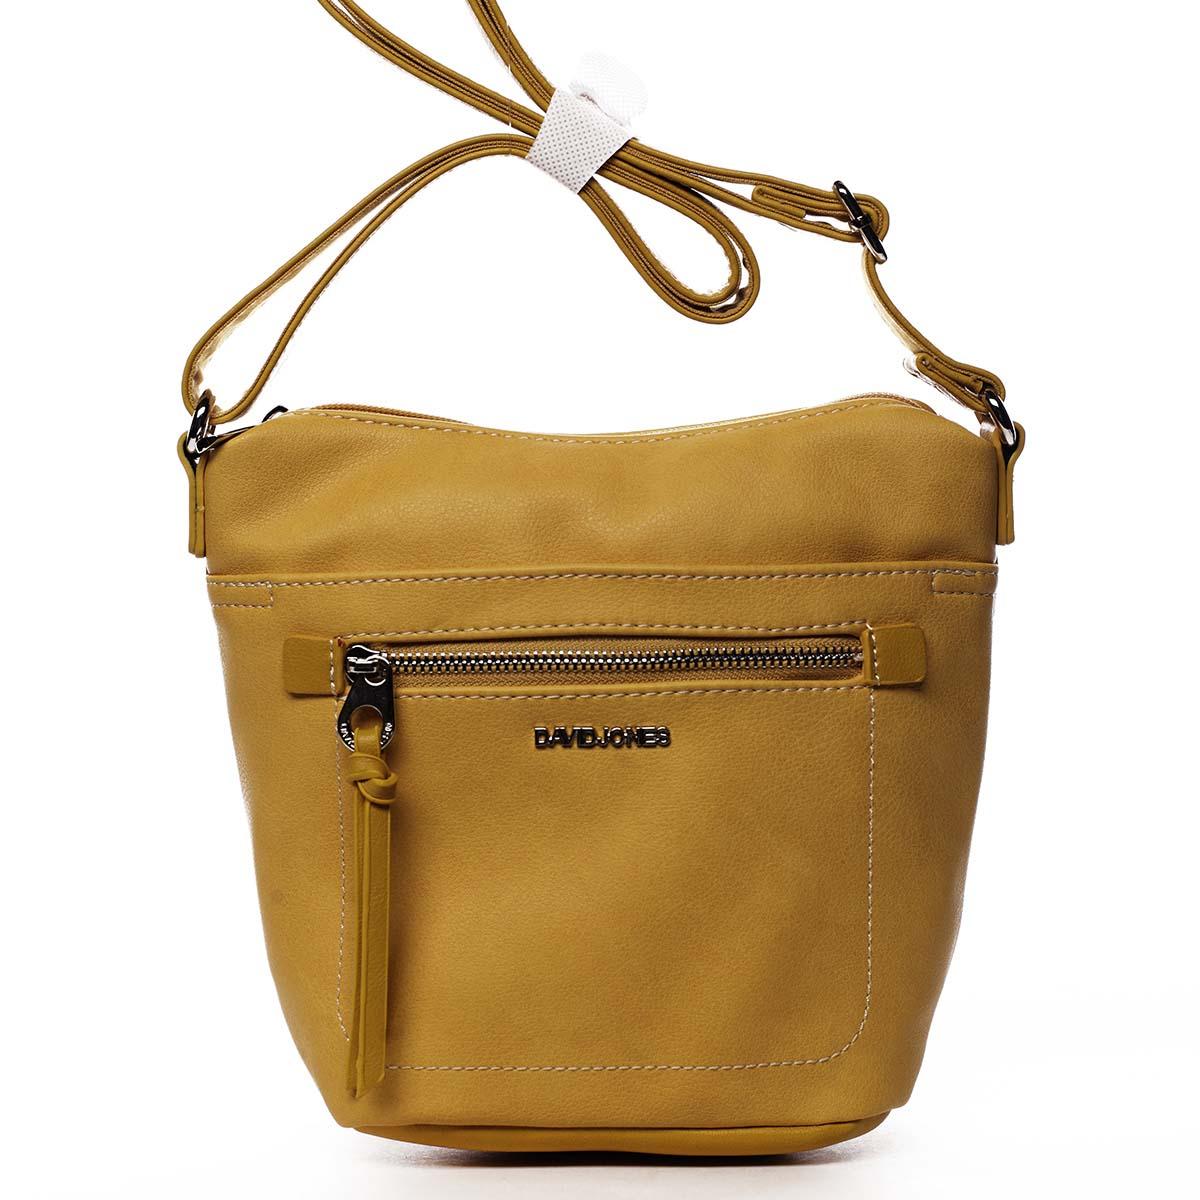 Dámská crossbody kabelka žlutá - David Jones Iayne žlutá